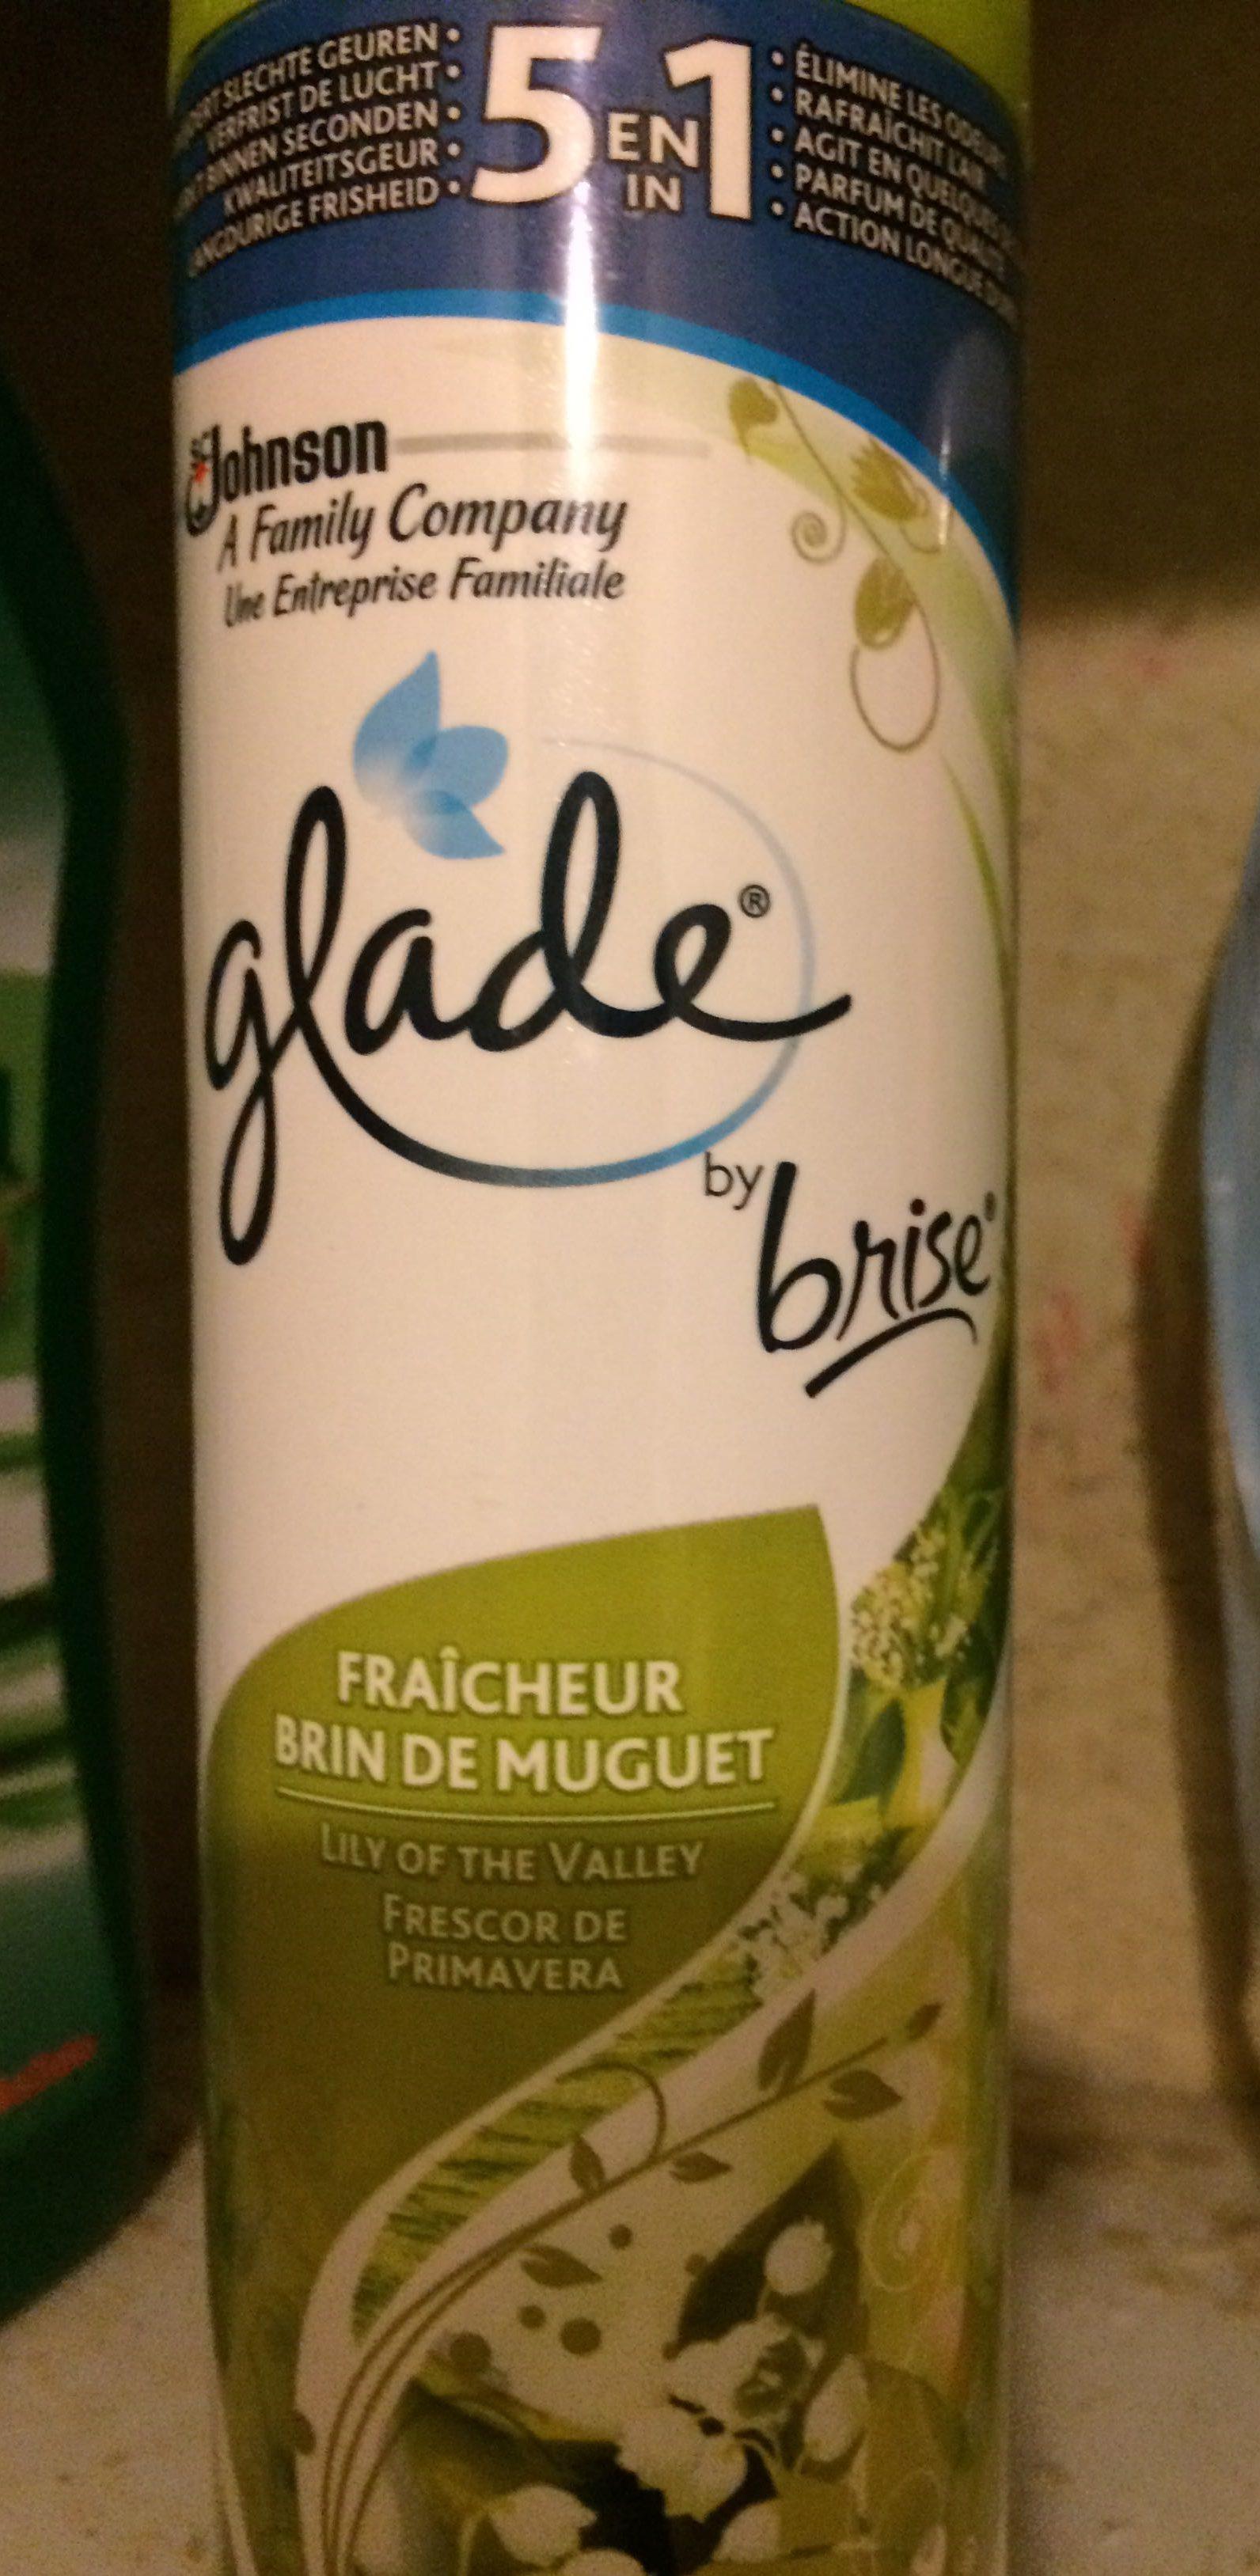 Parfum Glade Johnson fraicheur muguet - Produit - fr